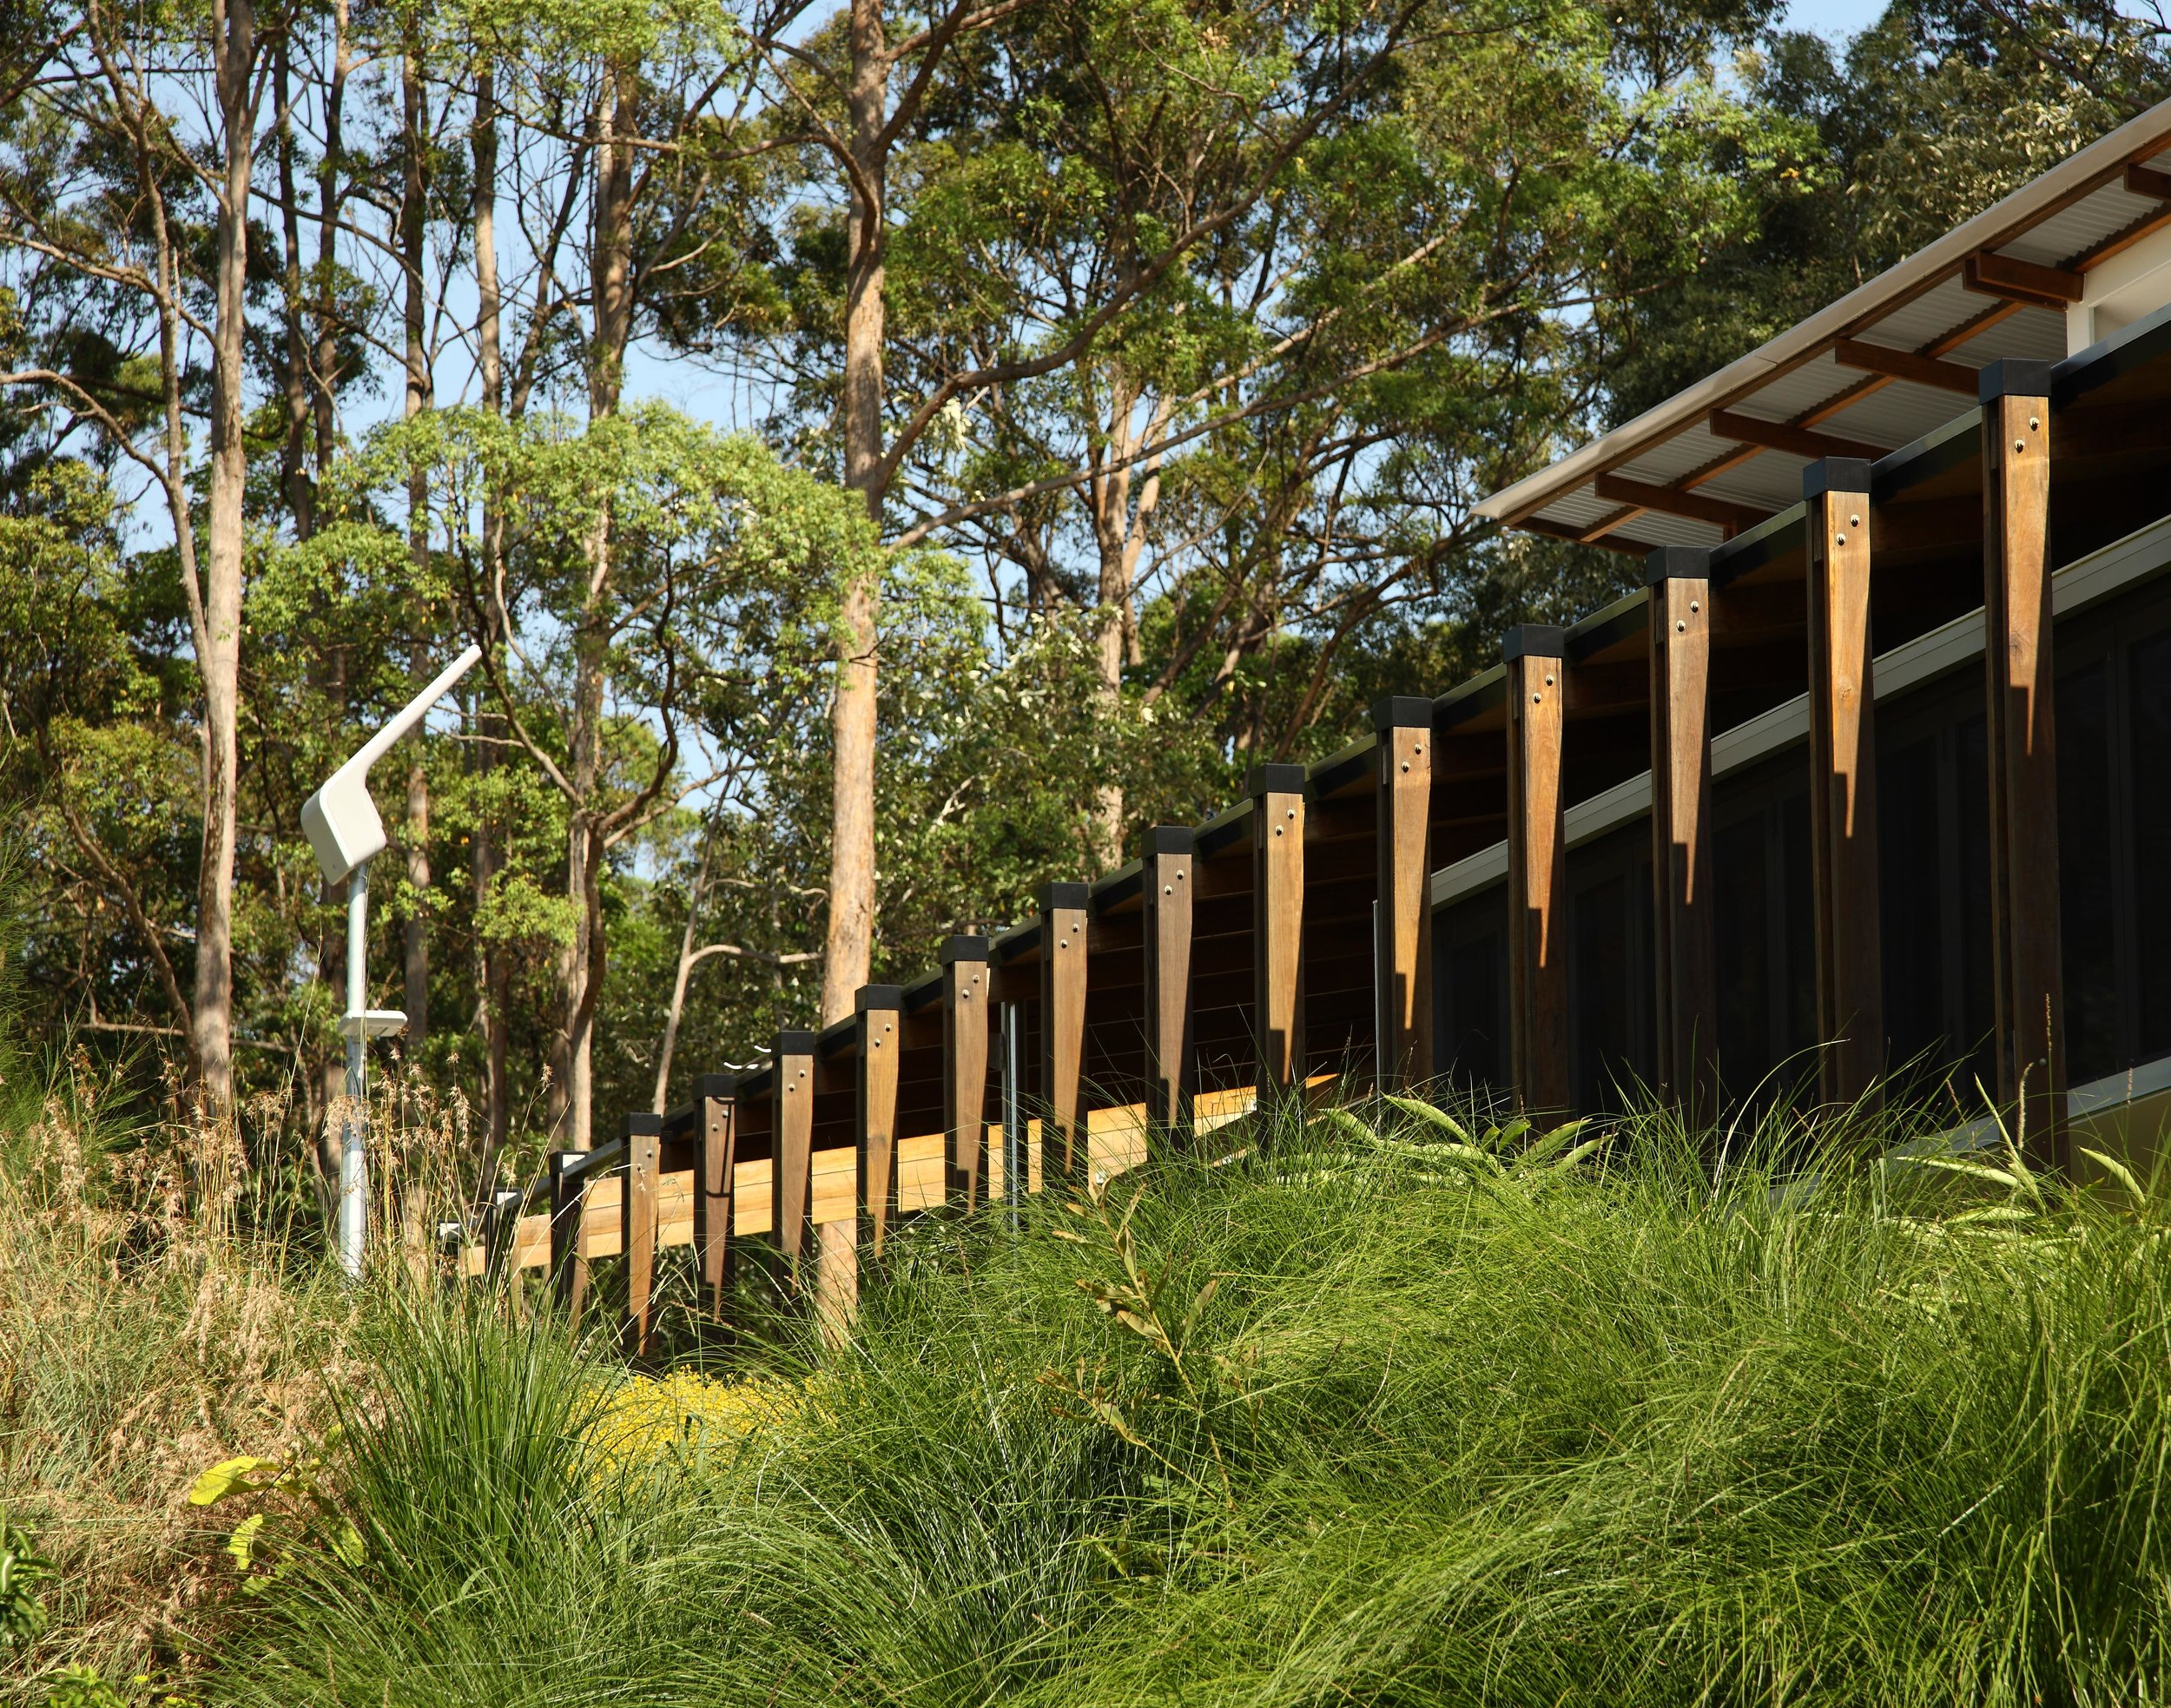 Maroochy-Botanic-Gardens-Guymer-Bailey-Landscape-12.jpg